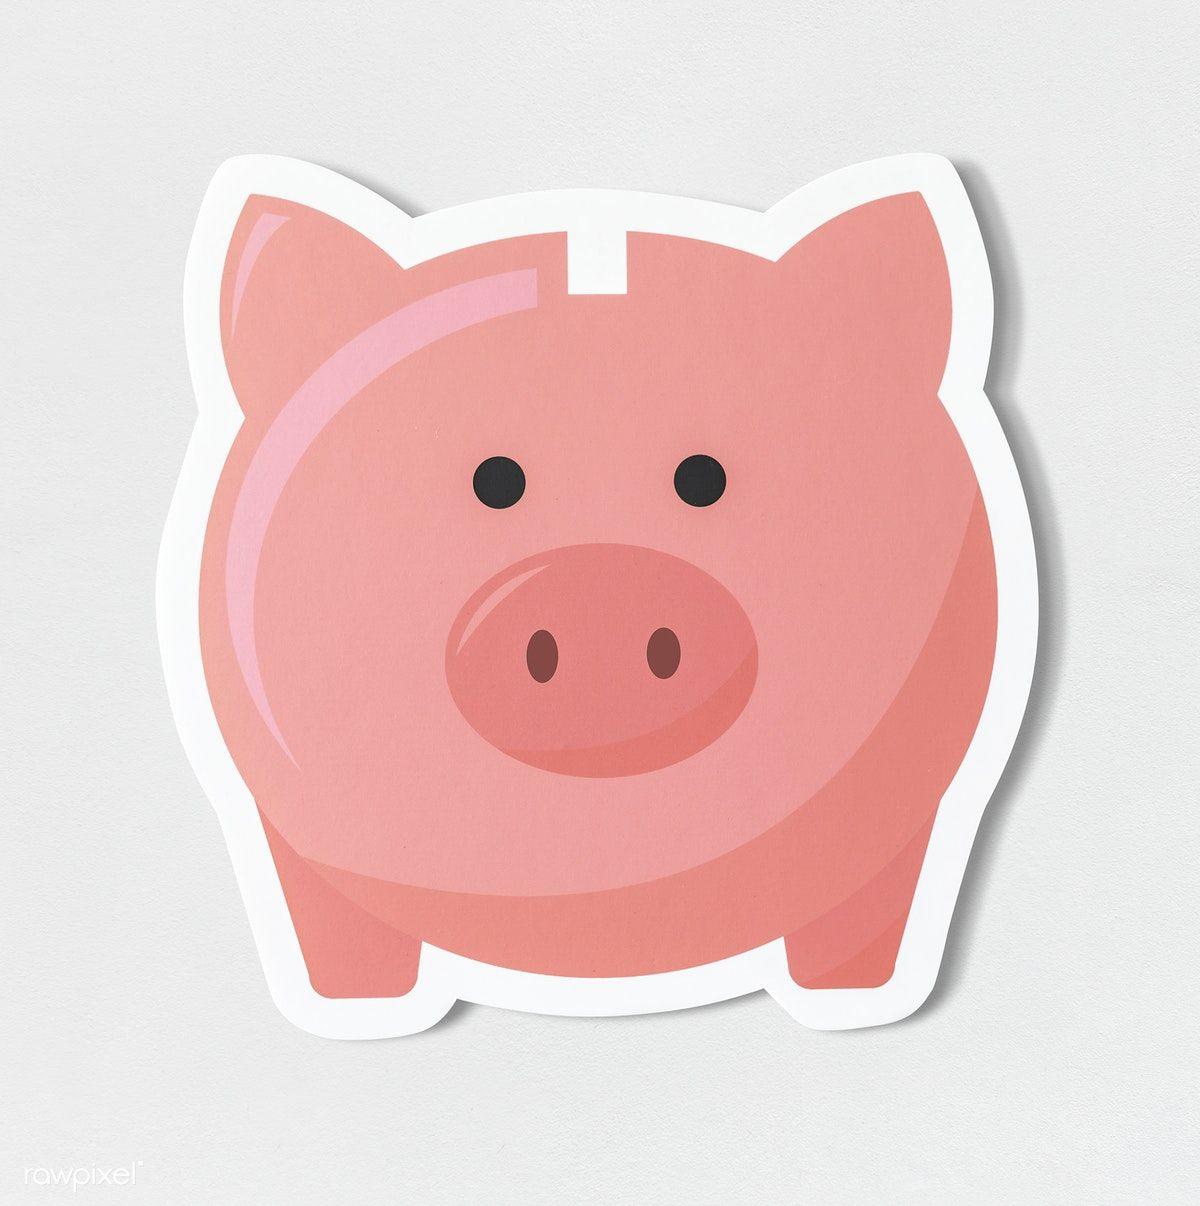 Download Premium Psd Of Pink Piggy Bank Savings Icon 402432 Pink Piggy Bank Savings Bank Piggy Bank